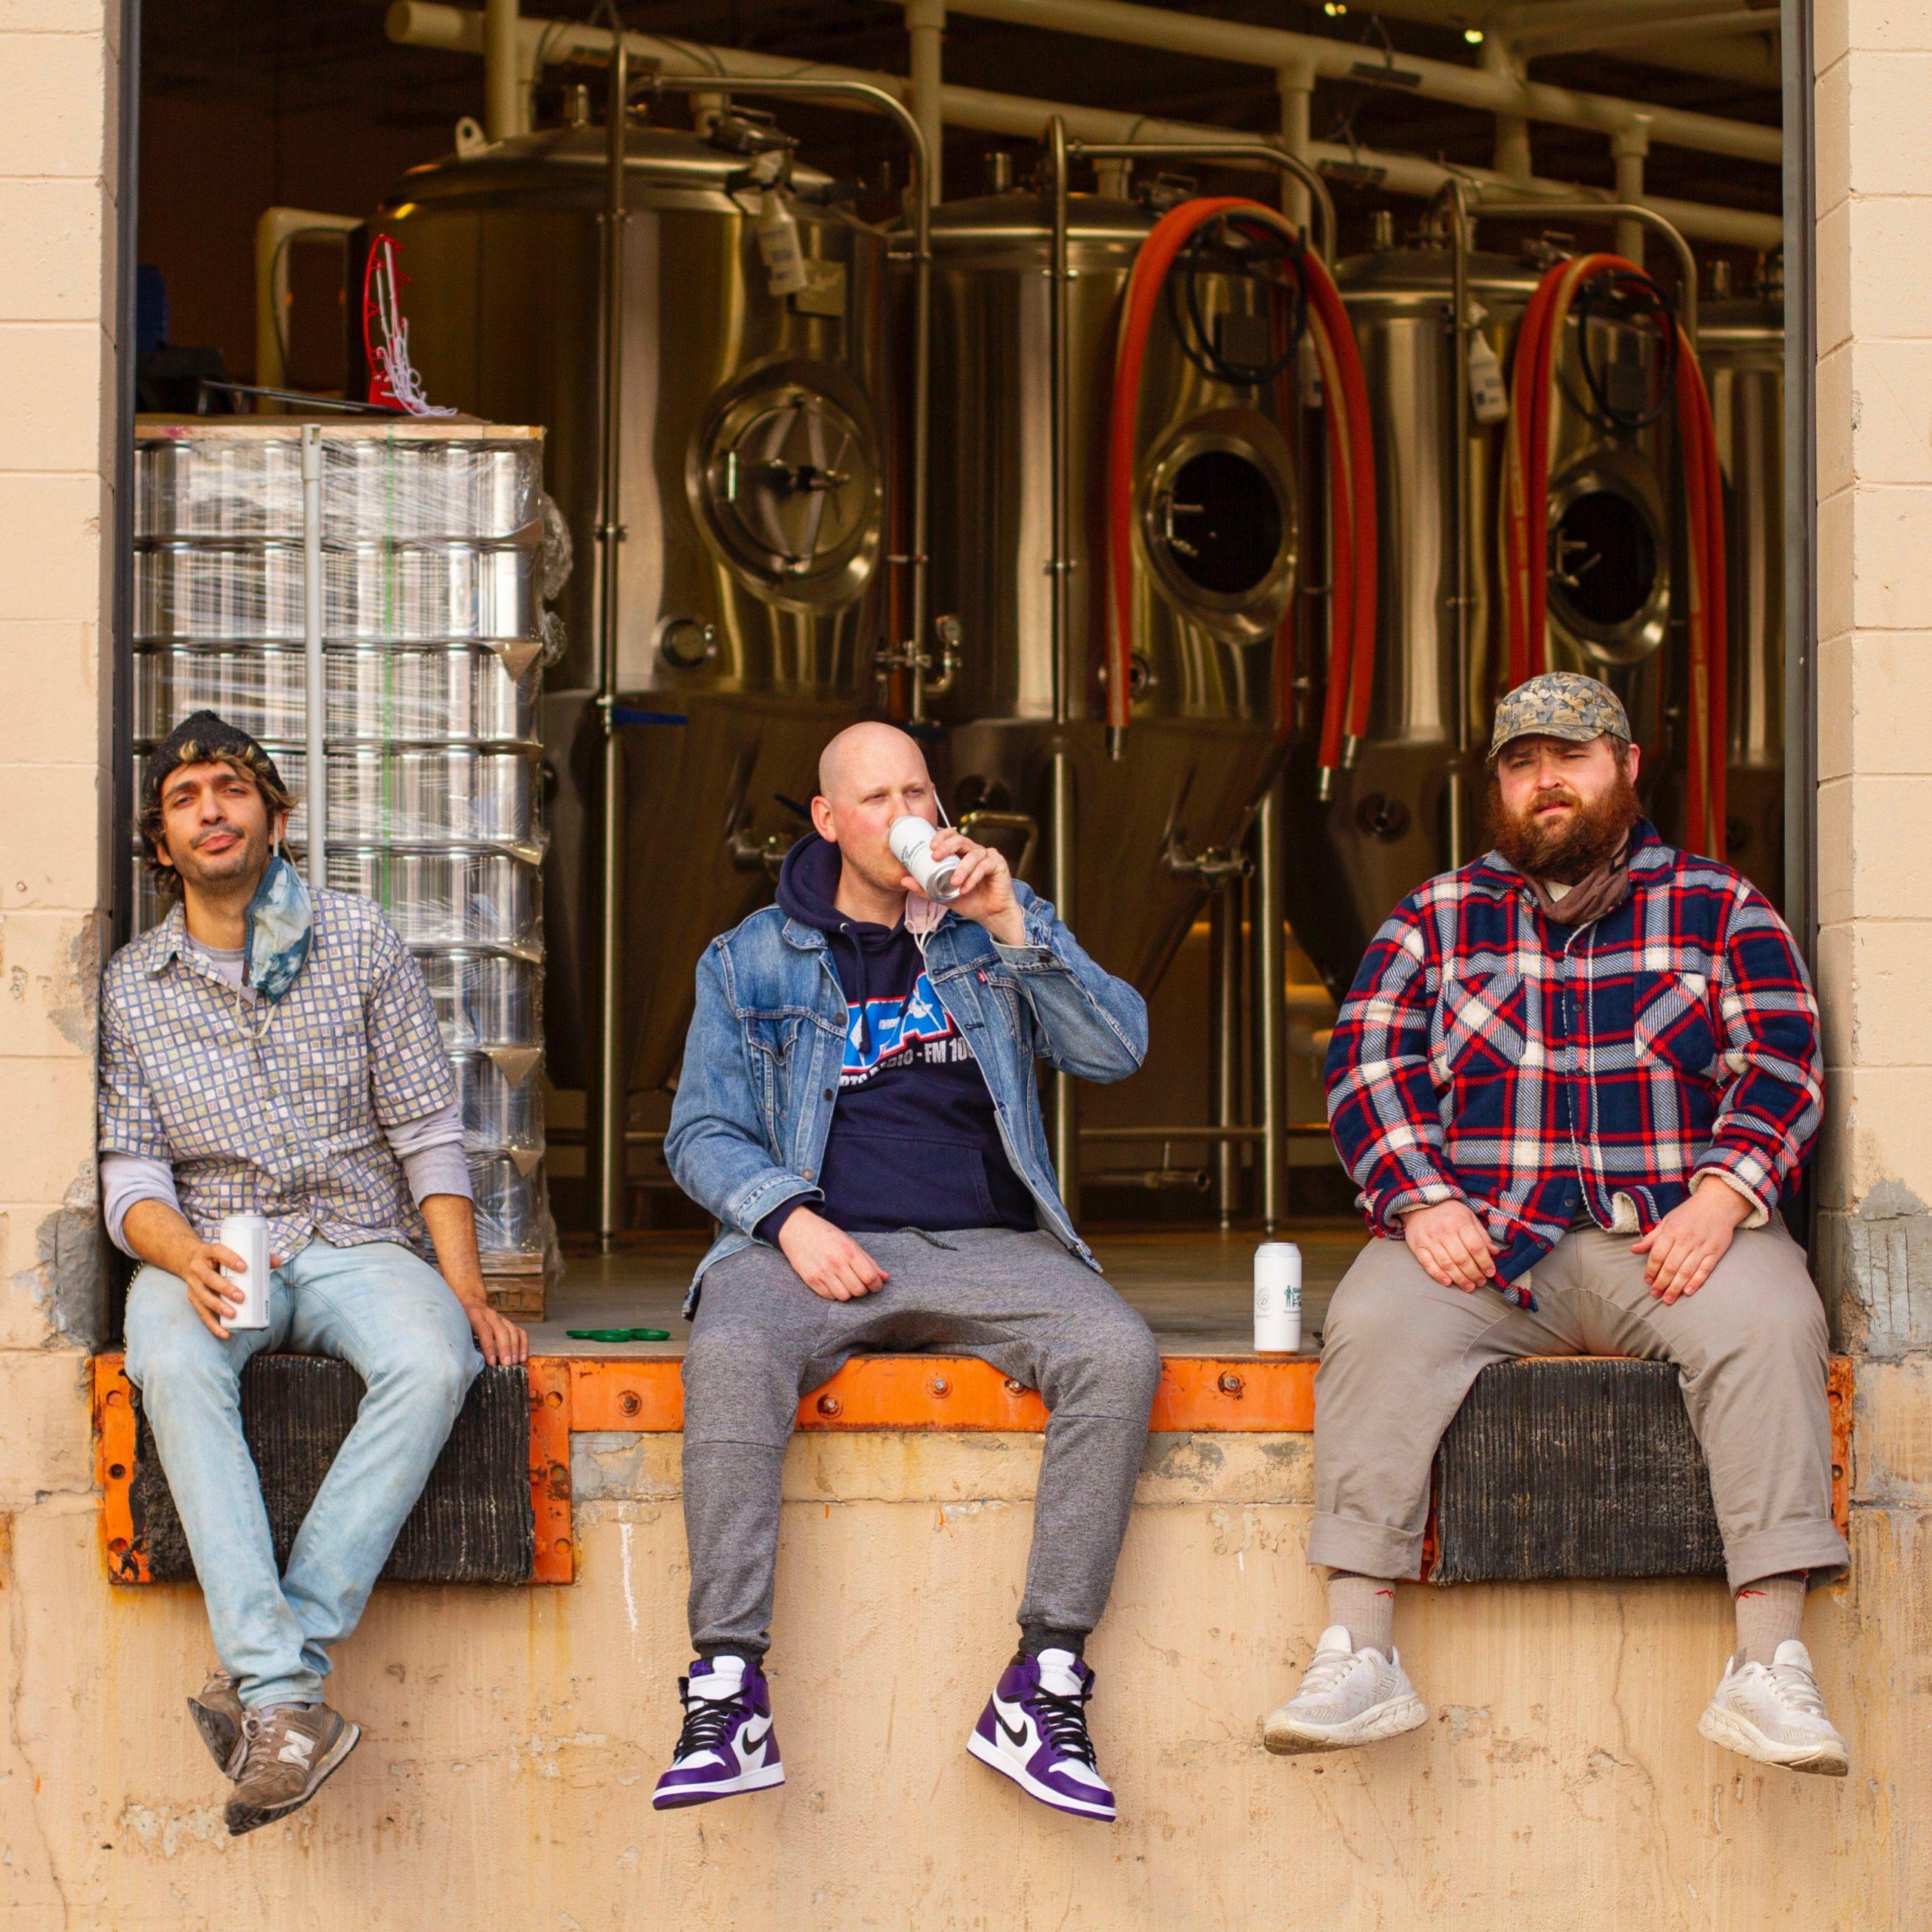 L to R: Bricksworth Beer Co.'s Chef Angelo Pennacchio, Steve Snyder, and Cooper Johnson • Photo via Bricksworth Beer Co.